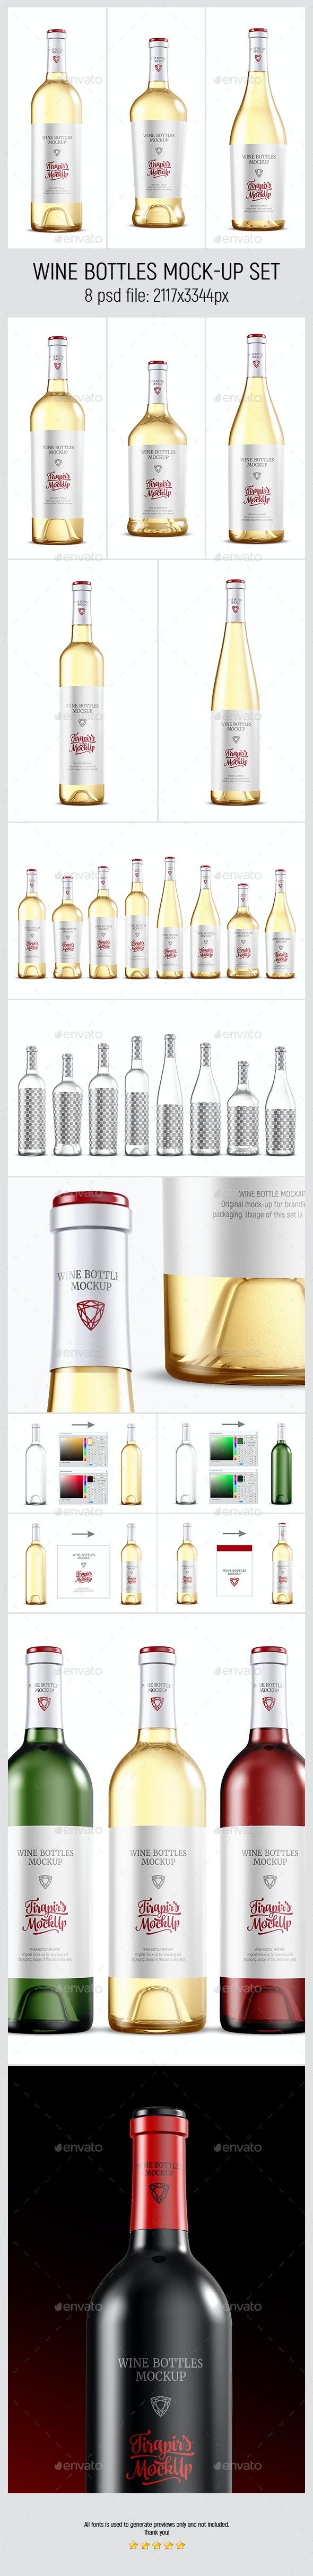 Wine Bottles Mockup Set - Food and Drink Packaging